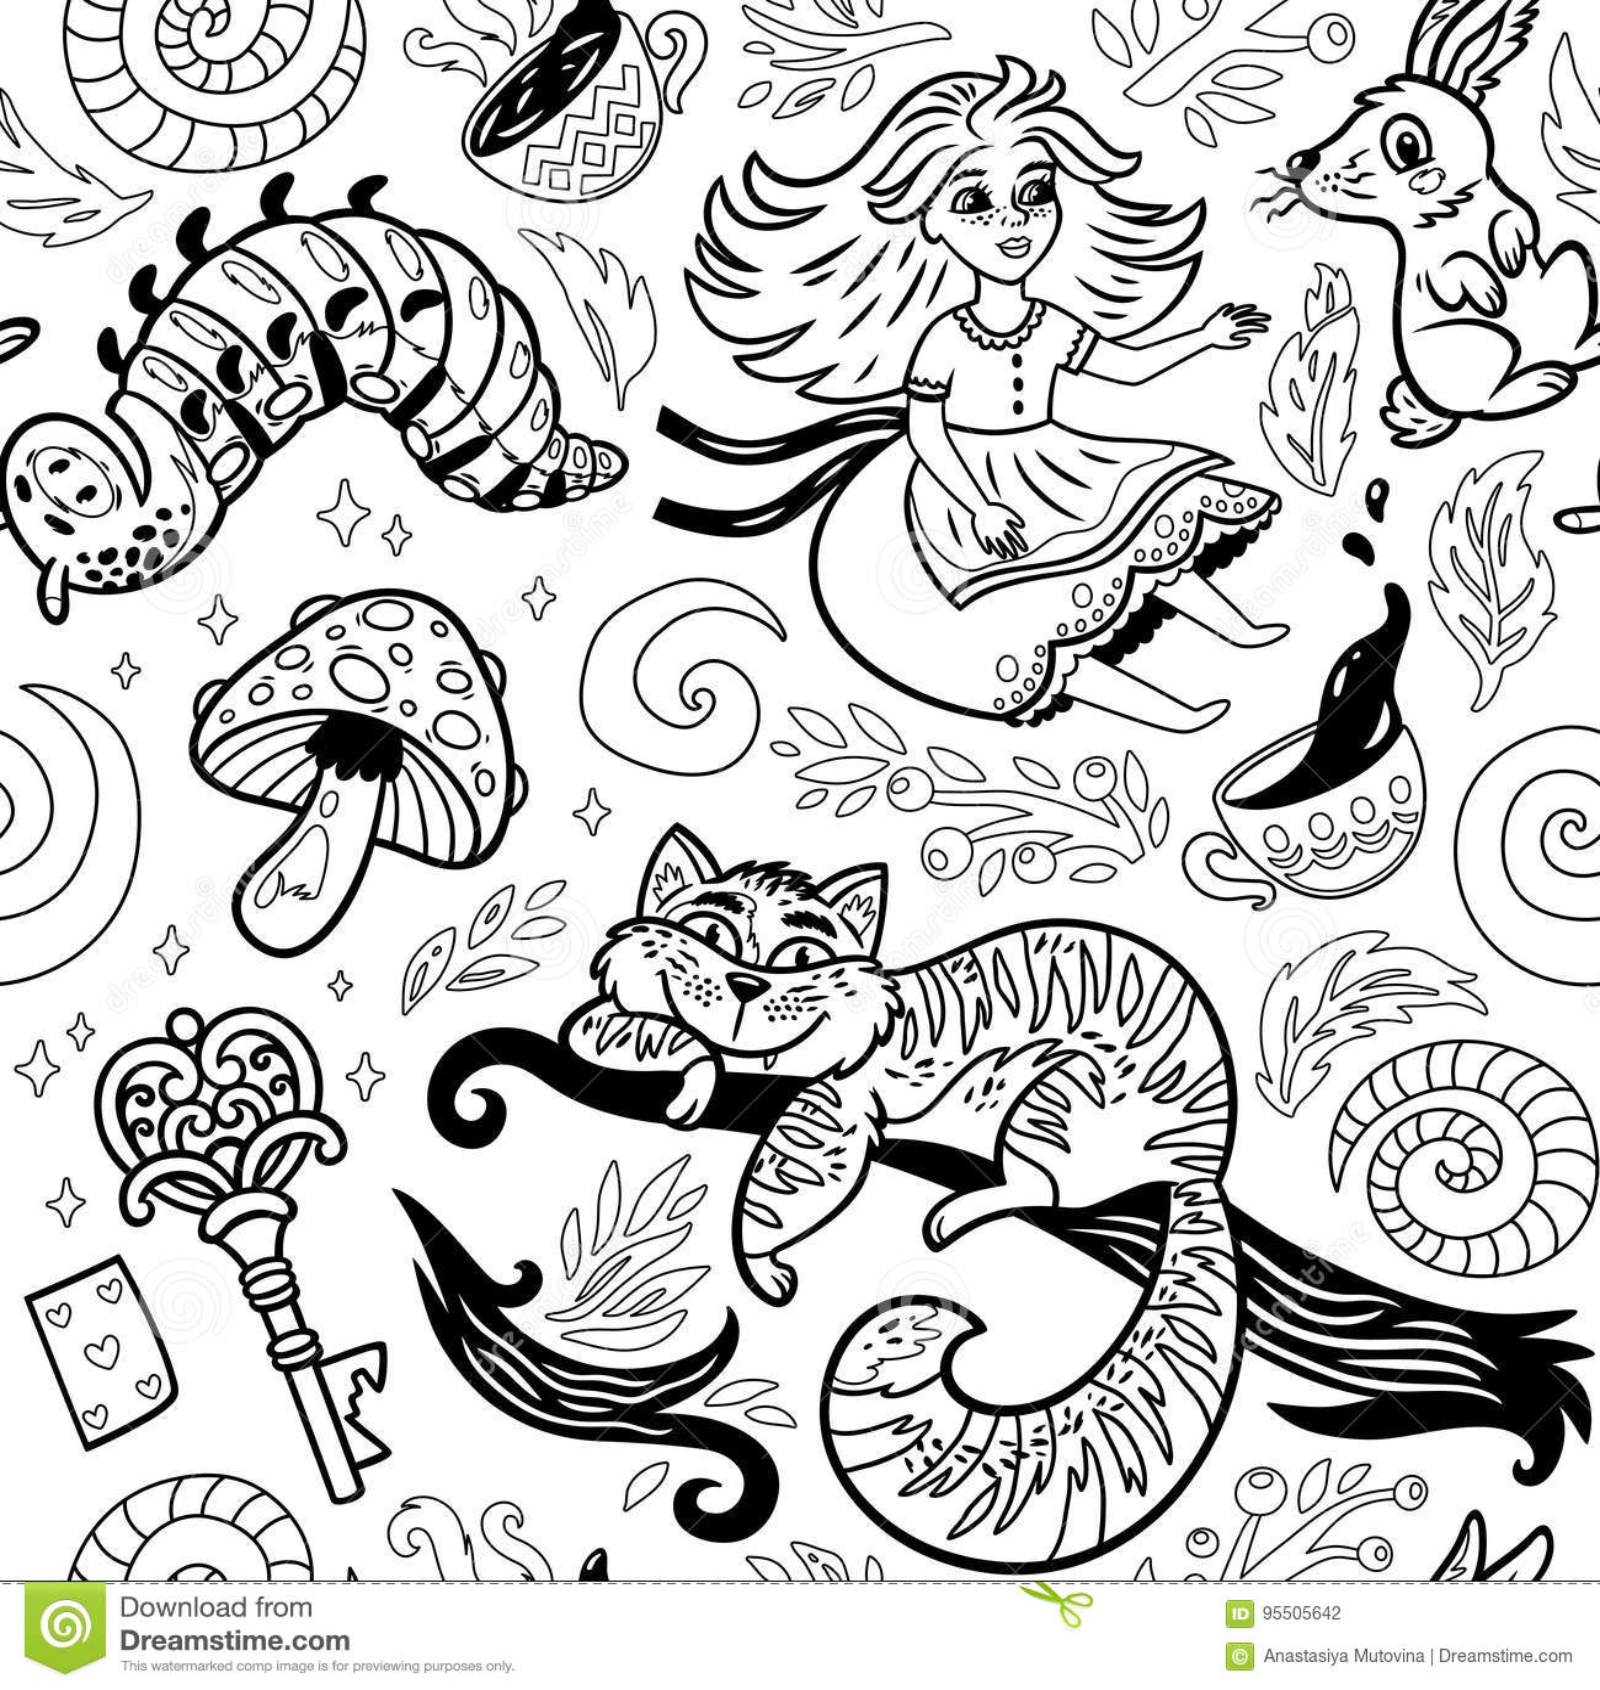 Alice in wonderland background story-3578